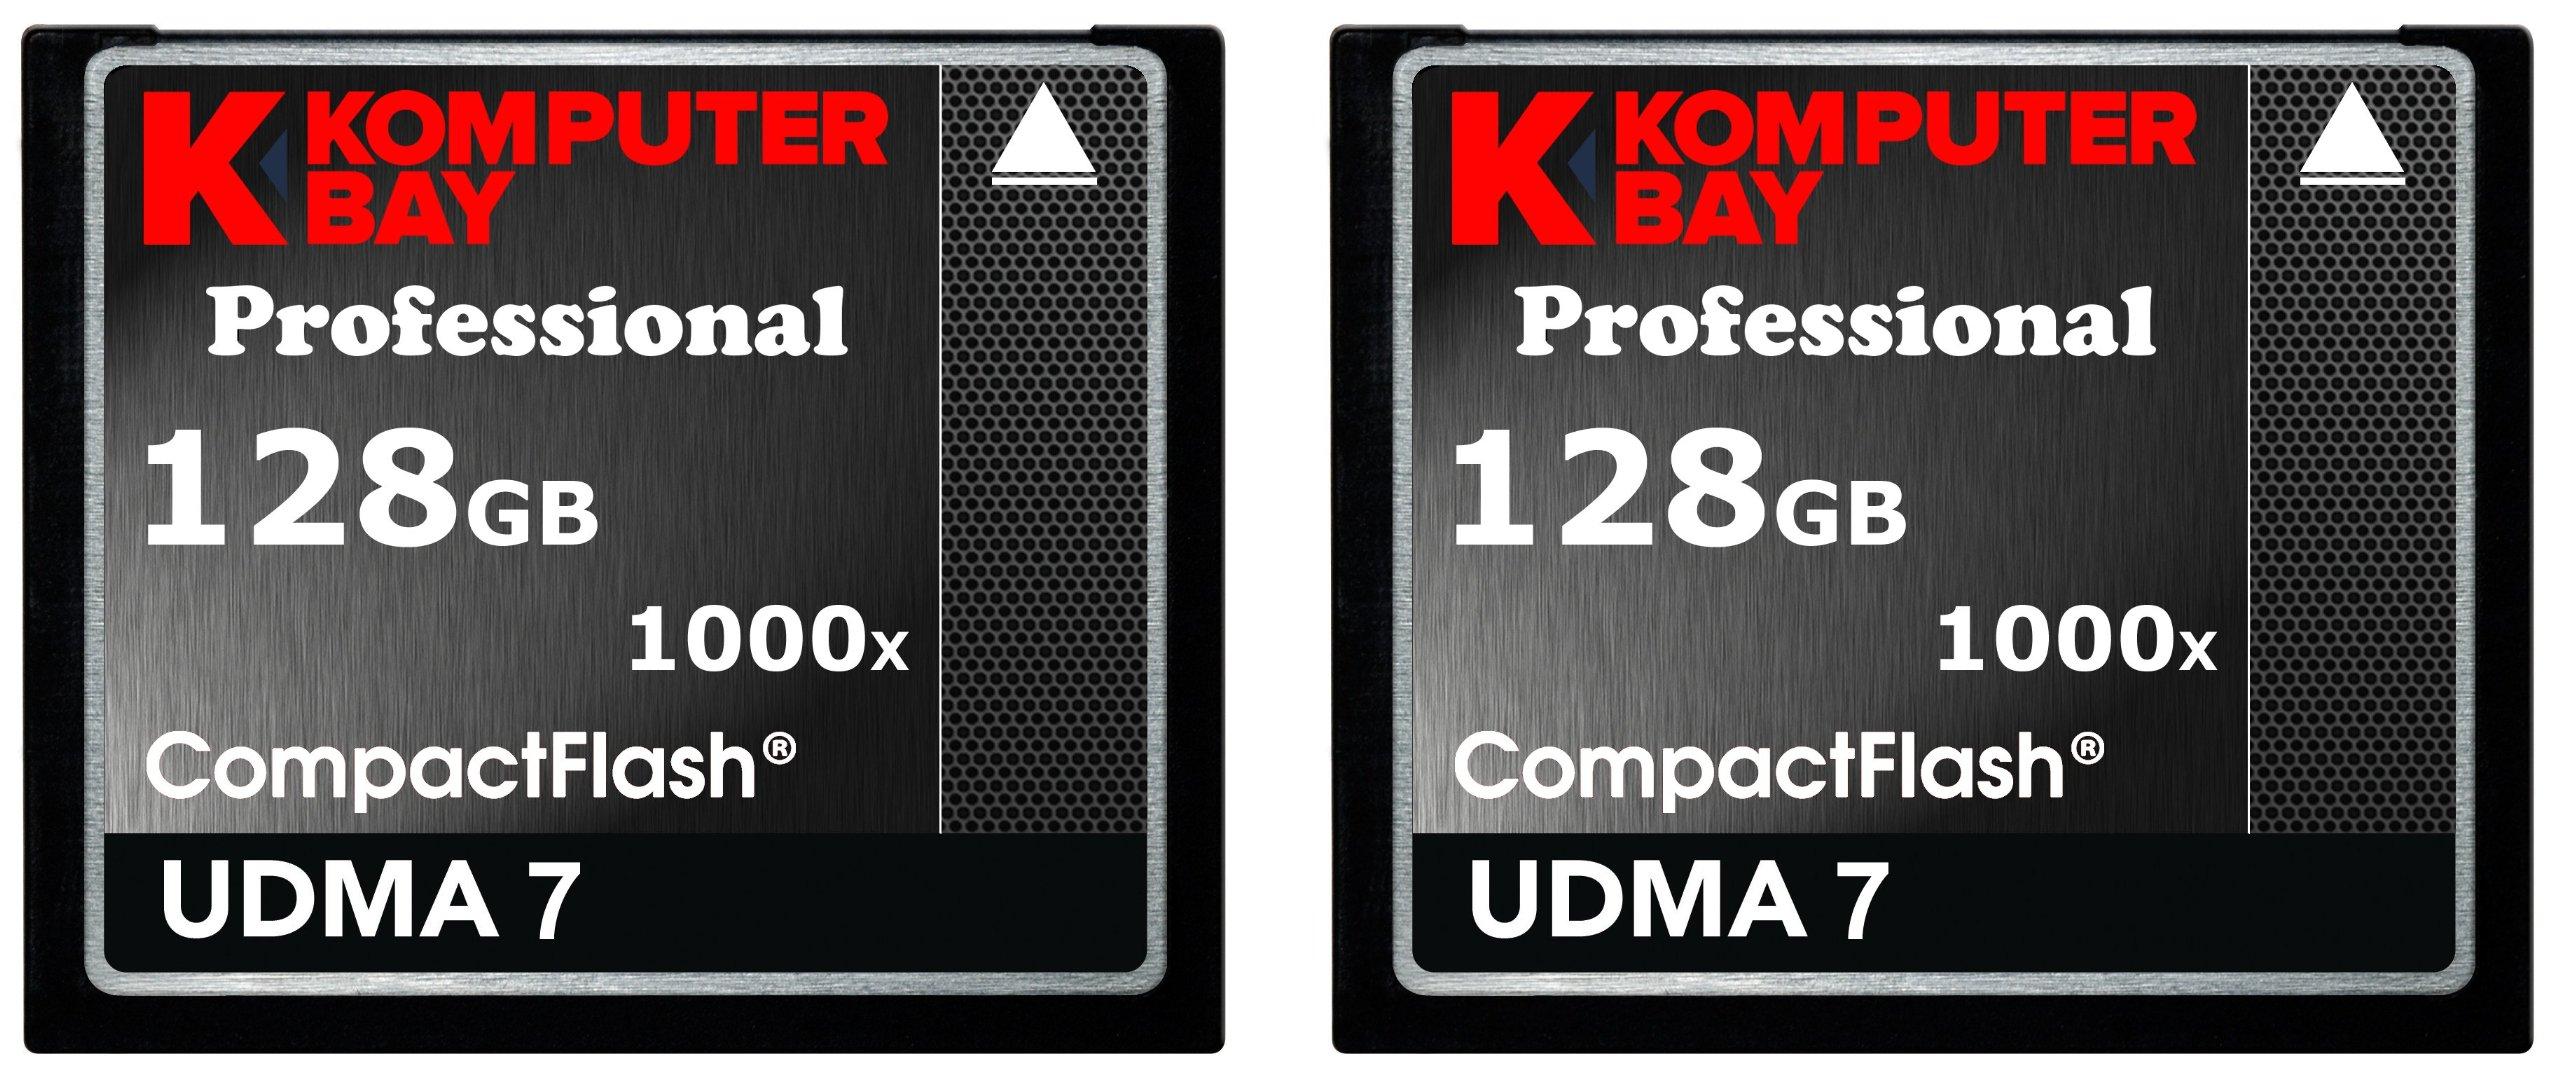 KOMPUTERBAY 2 PACK - 128GB Professional COMPACT FLASH CARD CF 1000X 150MB/s Extreme Speed UDMA 7 RAW 128 GB